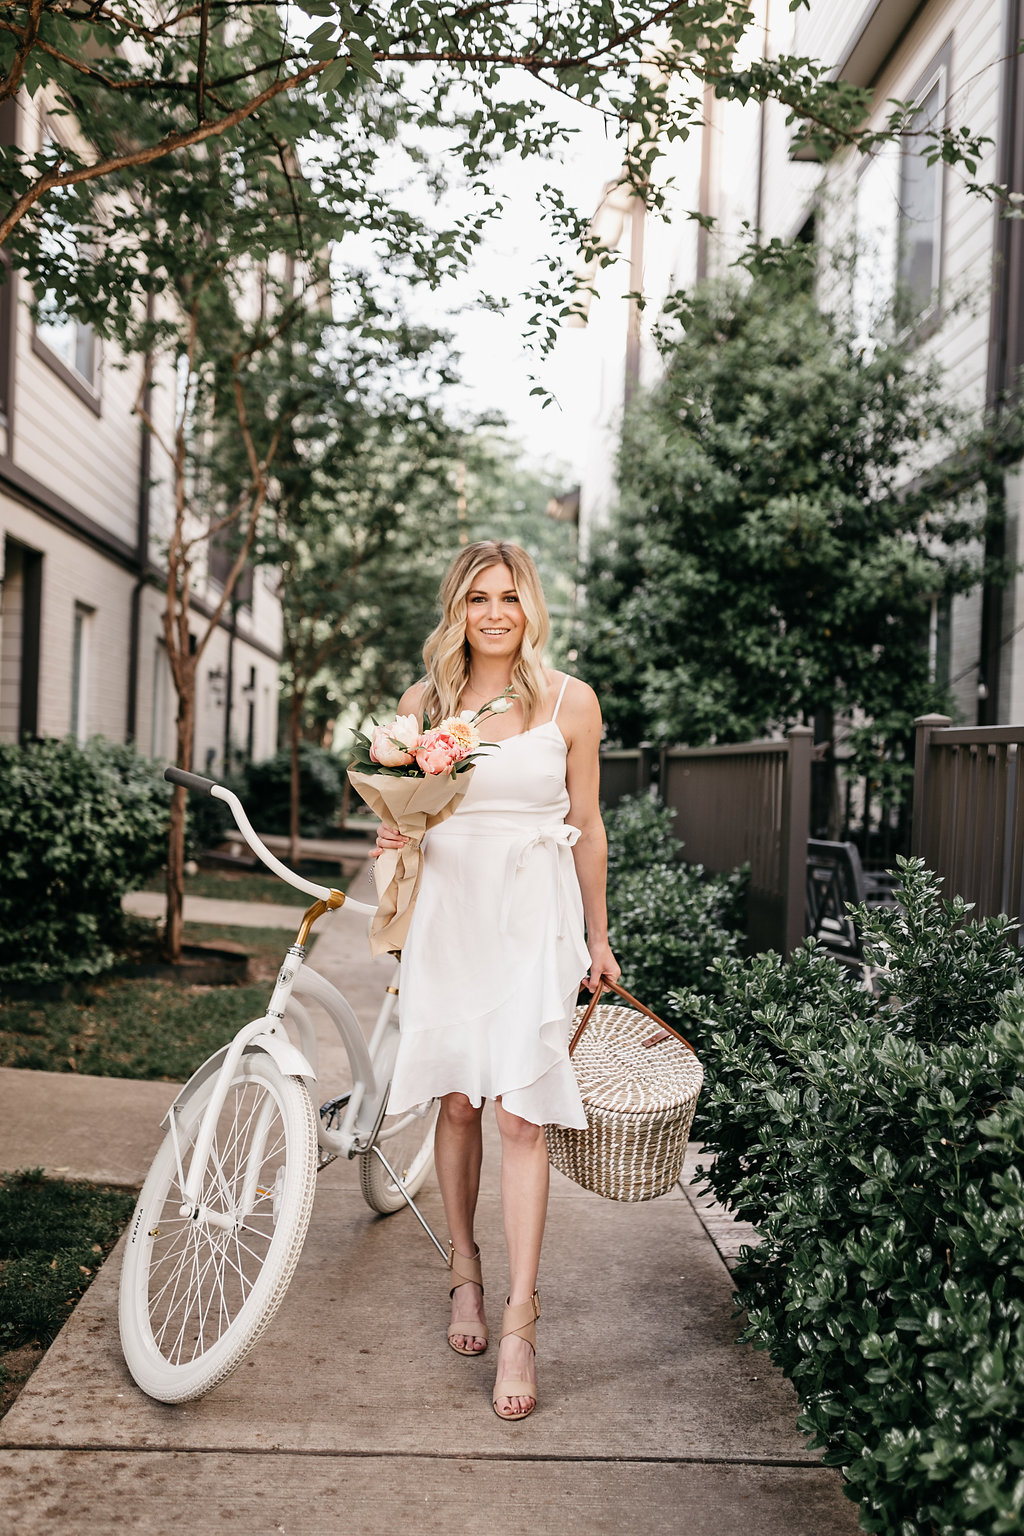 SUMMER DATE NIGHT IDEAS IN DALLAS - One Small Blonde